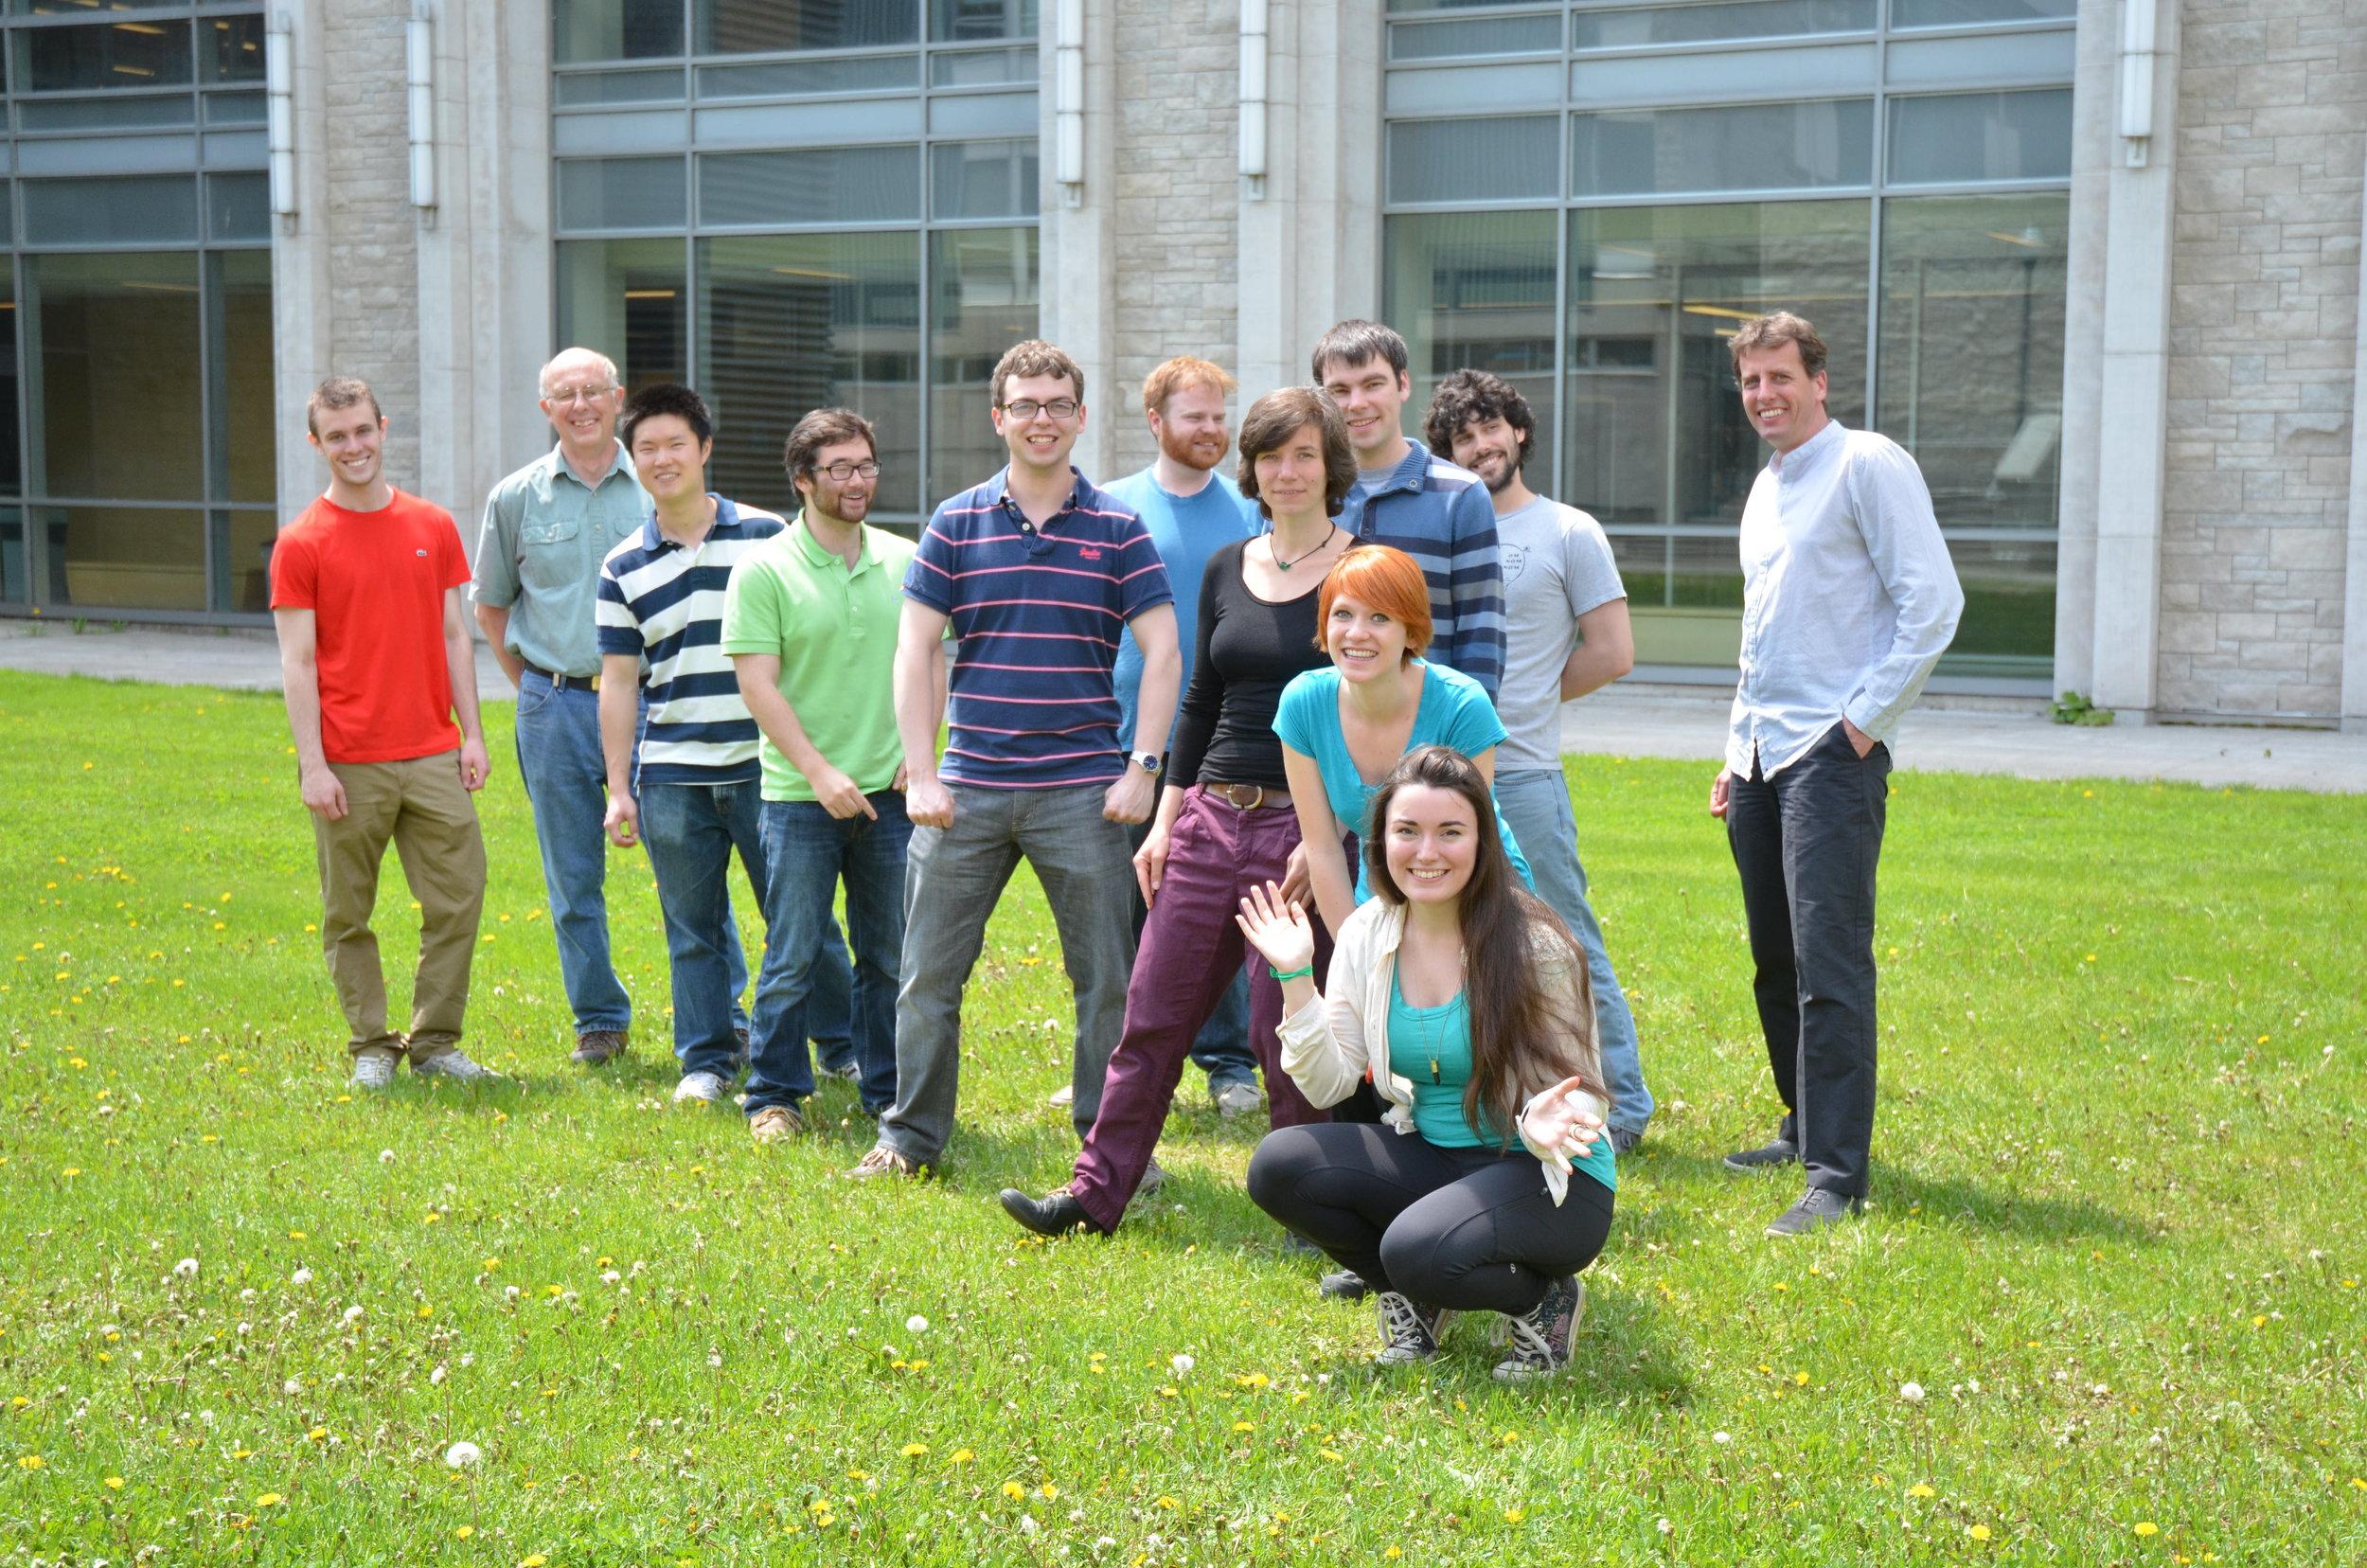 Group Photo, Summer 2014